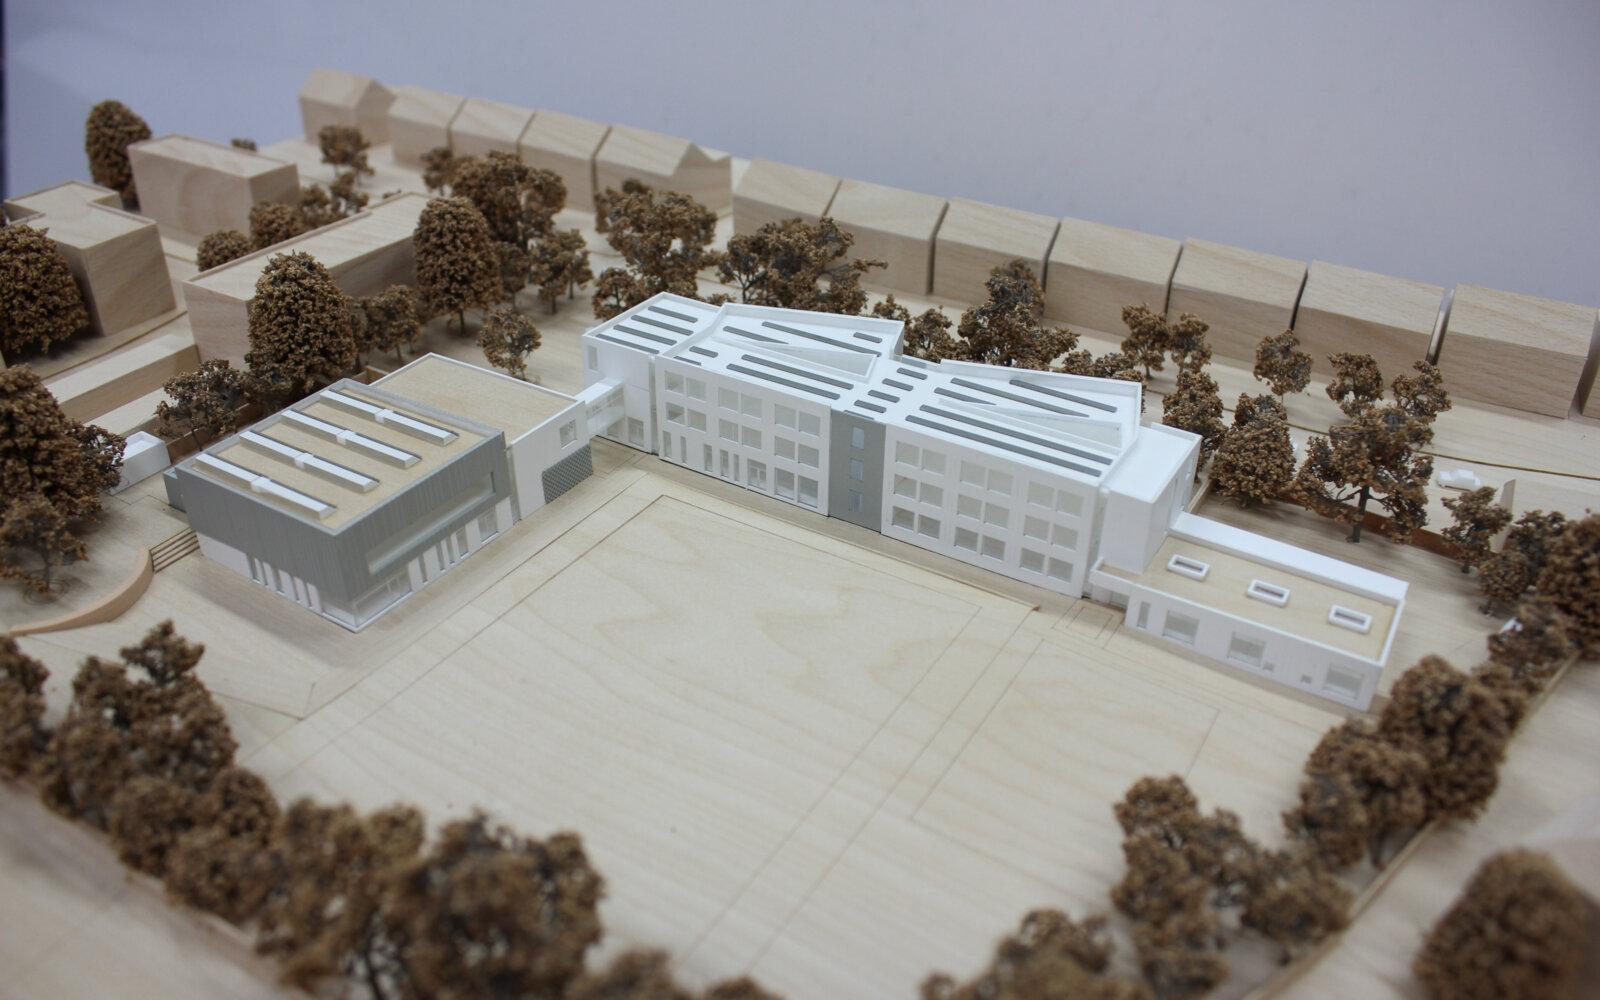 Durston House School model